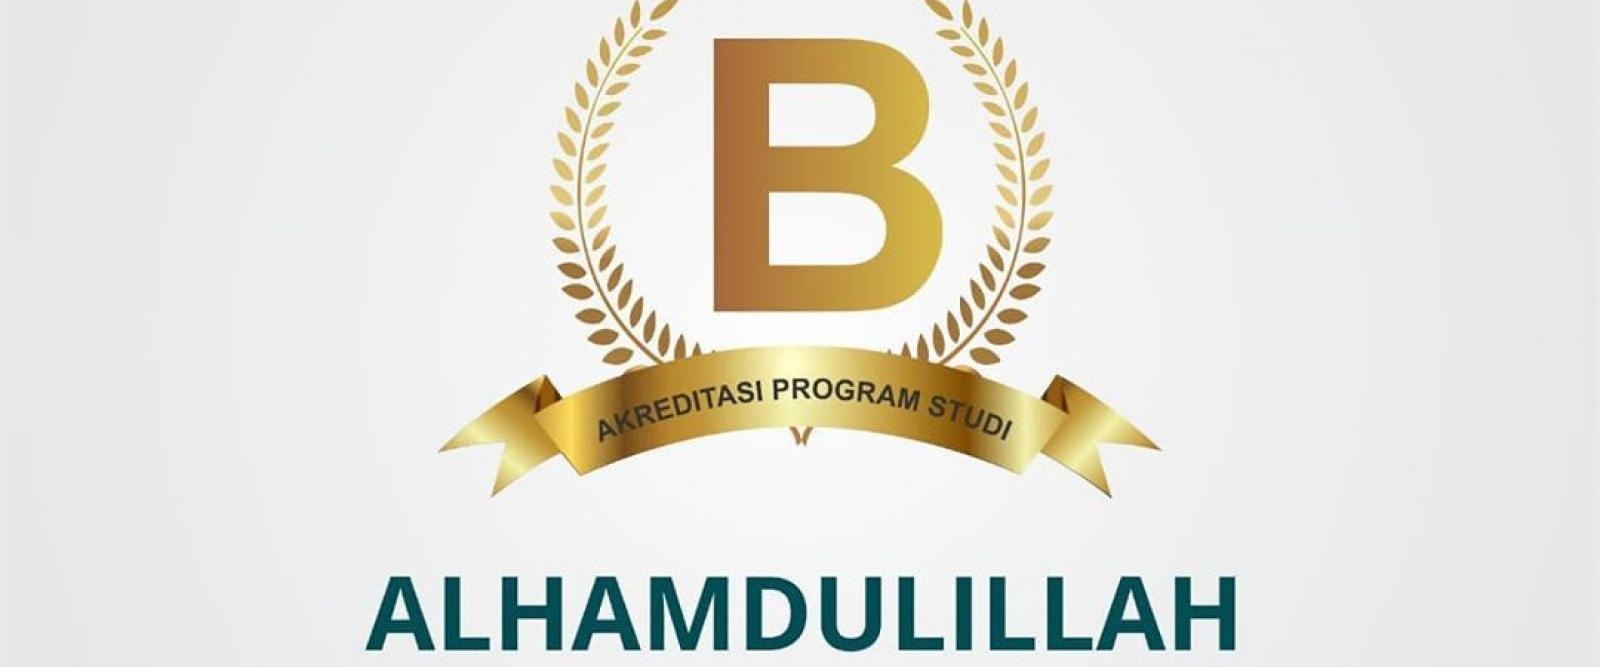 Program Studi Teknik Informatika mendapatkan Akreditasi